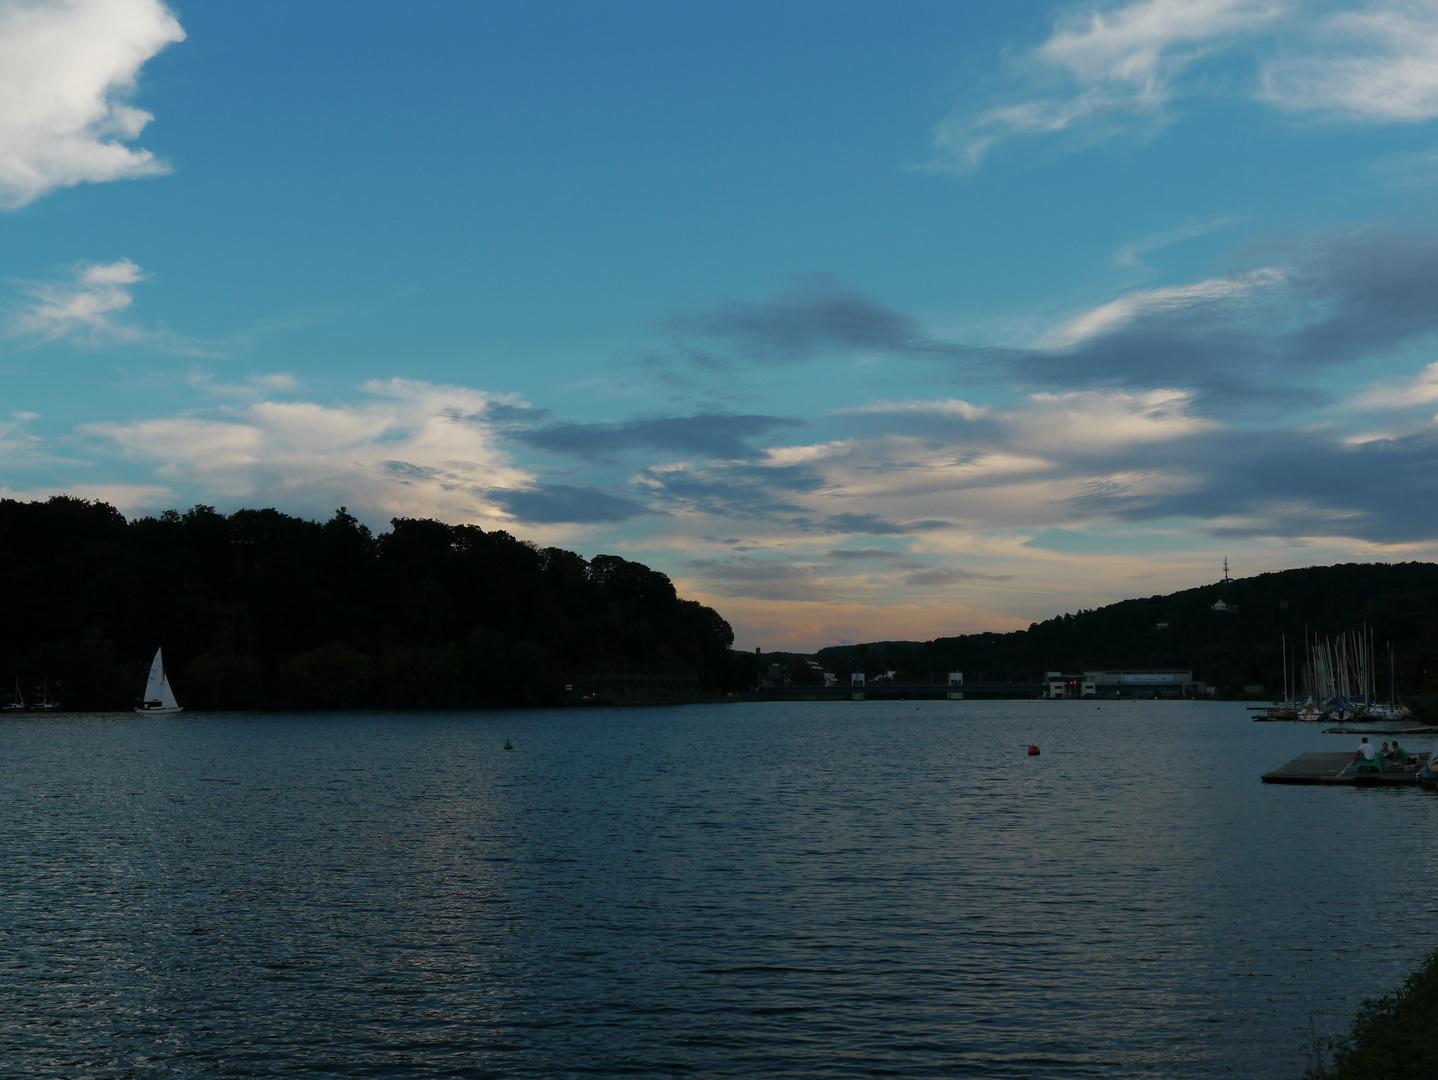 Sonnenuntergang am Baldeneysee